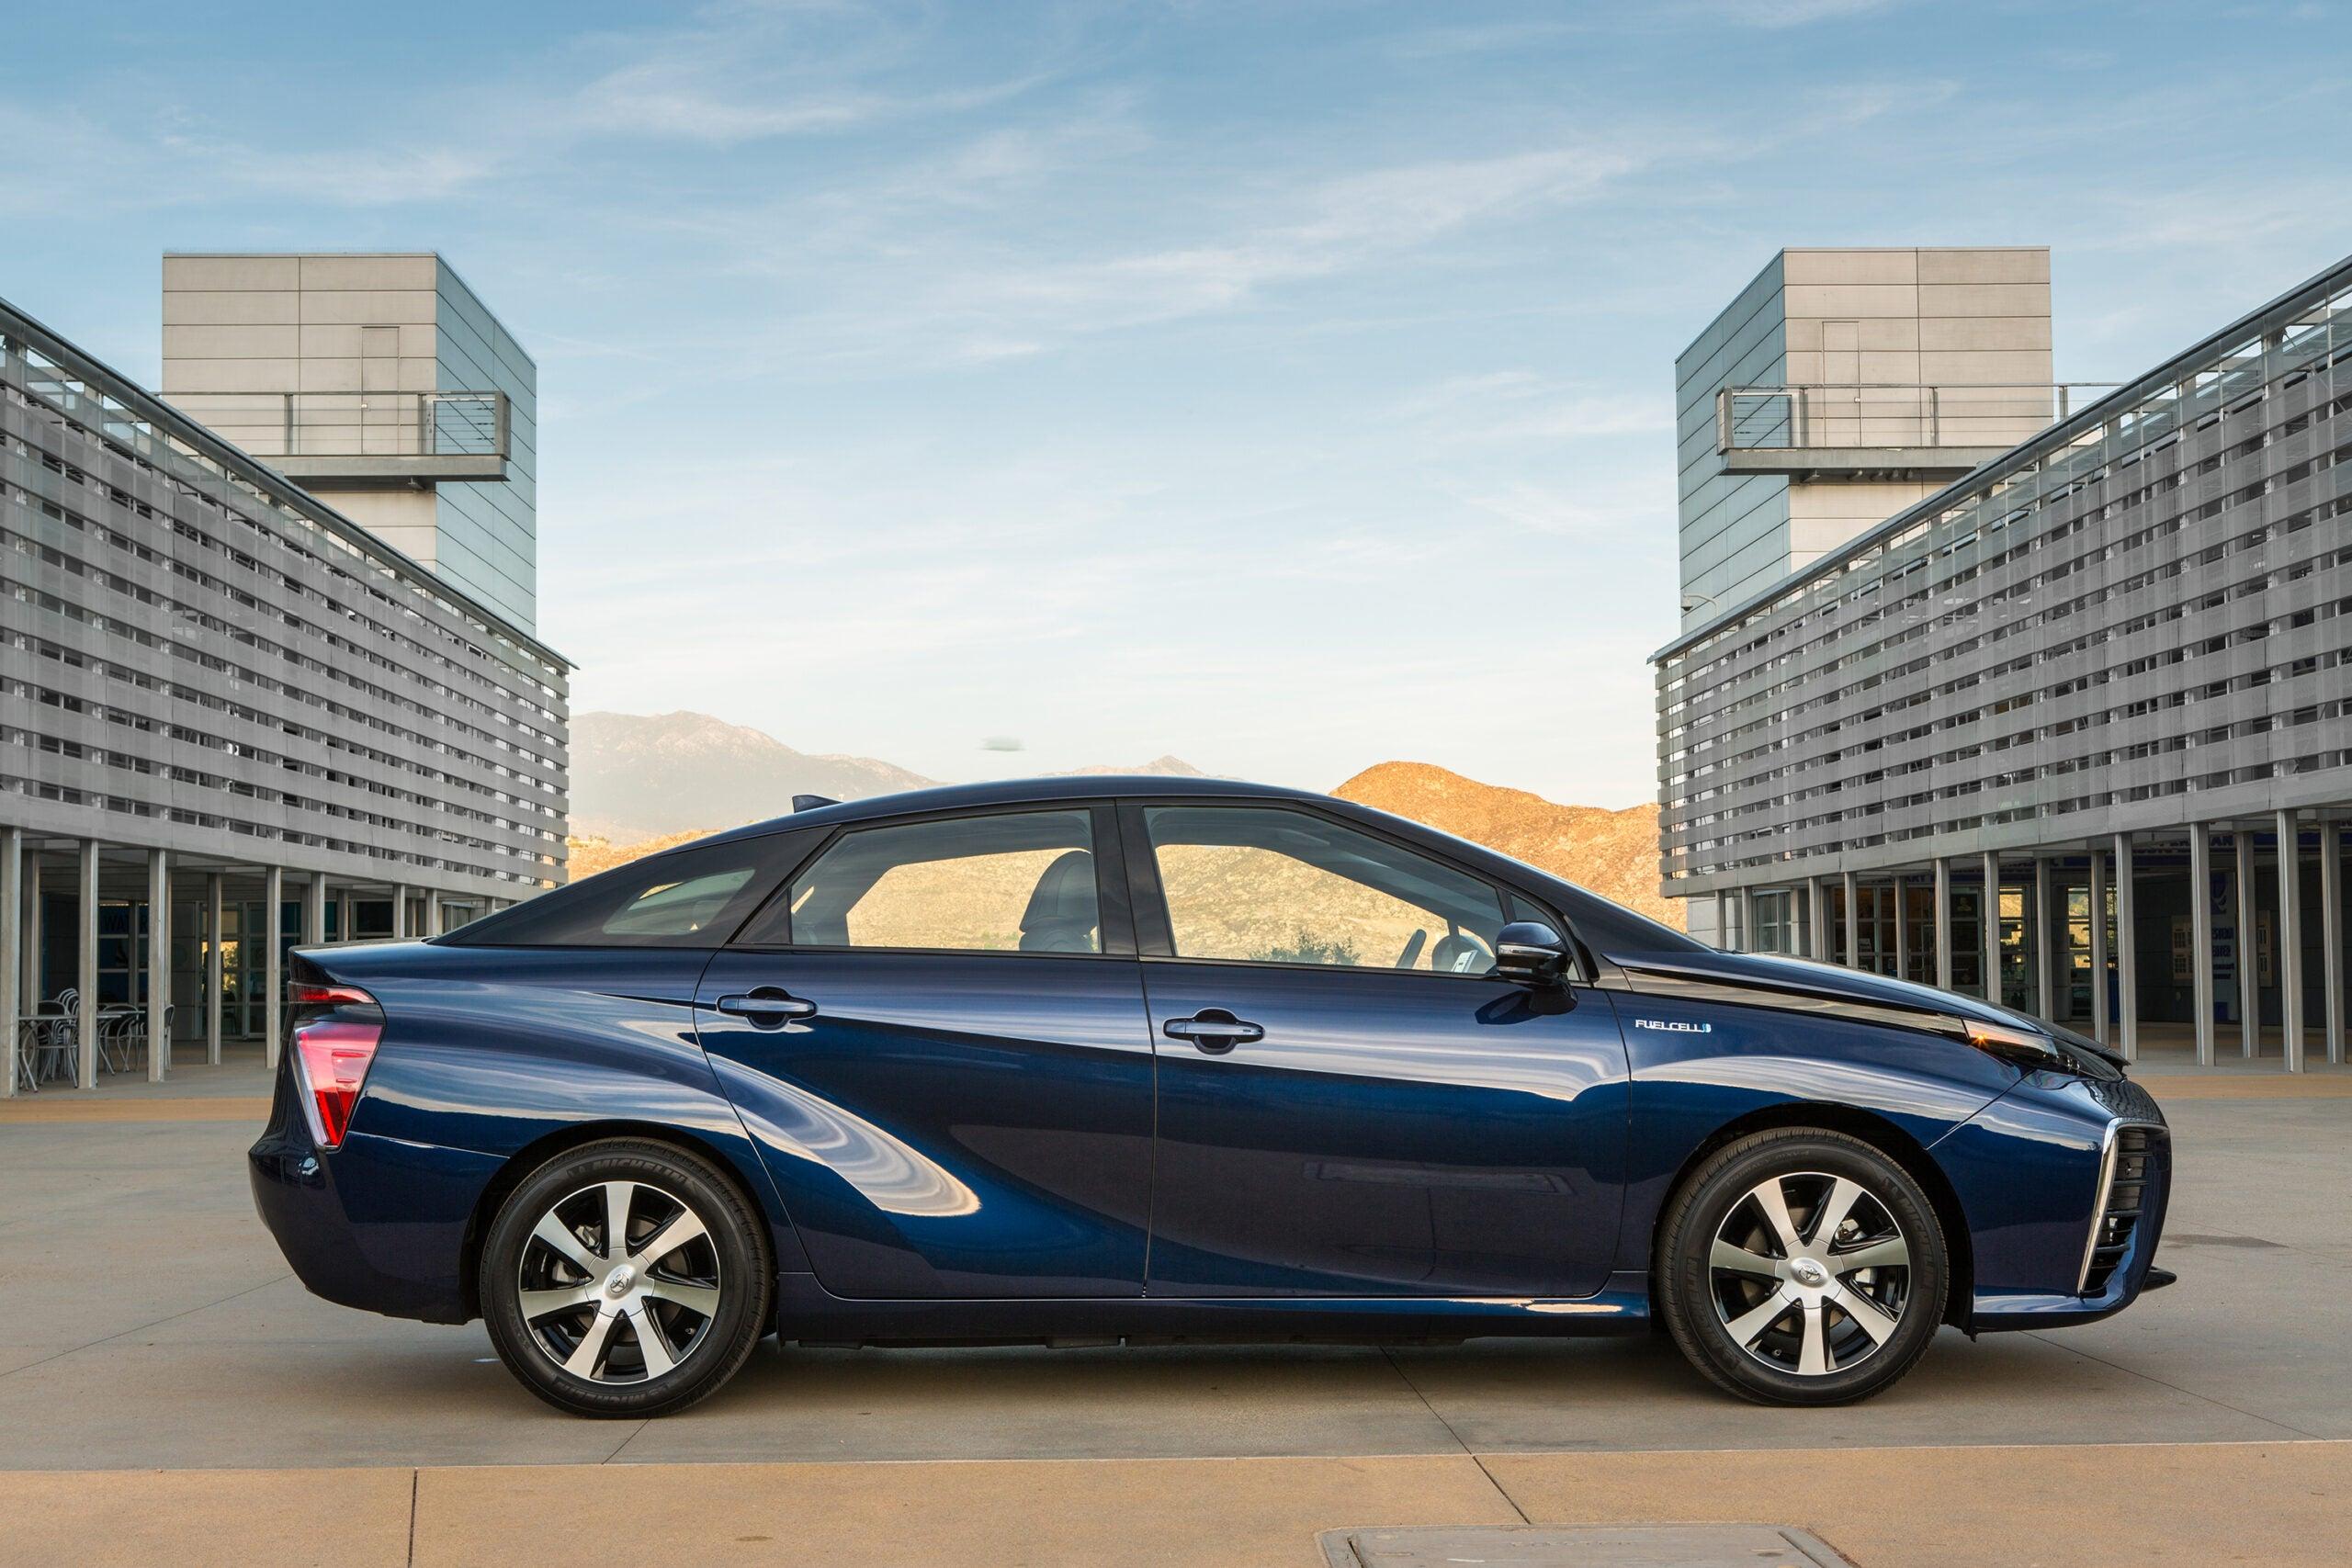 Toyota Mirai Has Longest Range Of Any Zero-Emissions Vehicle